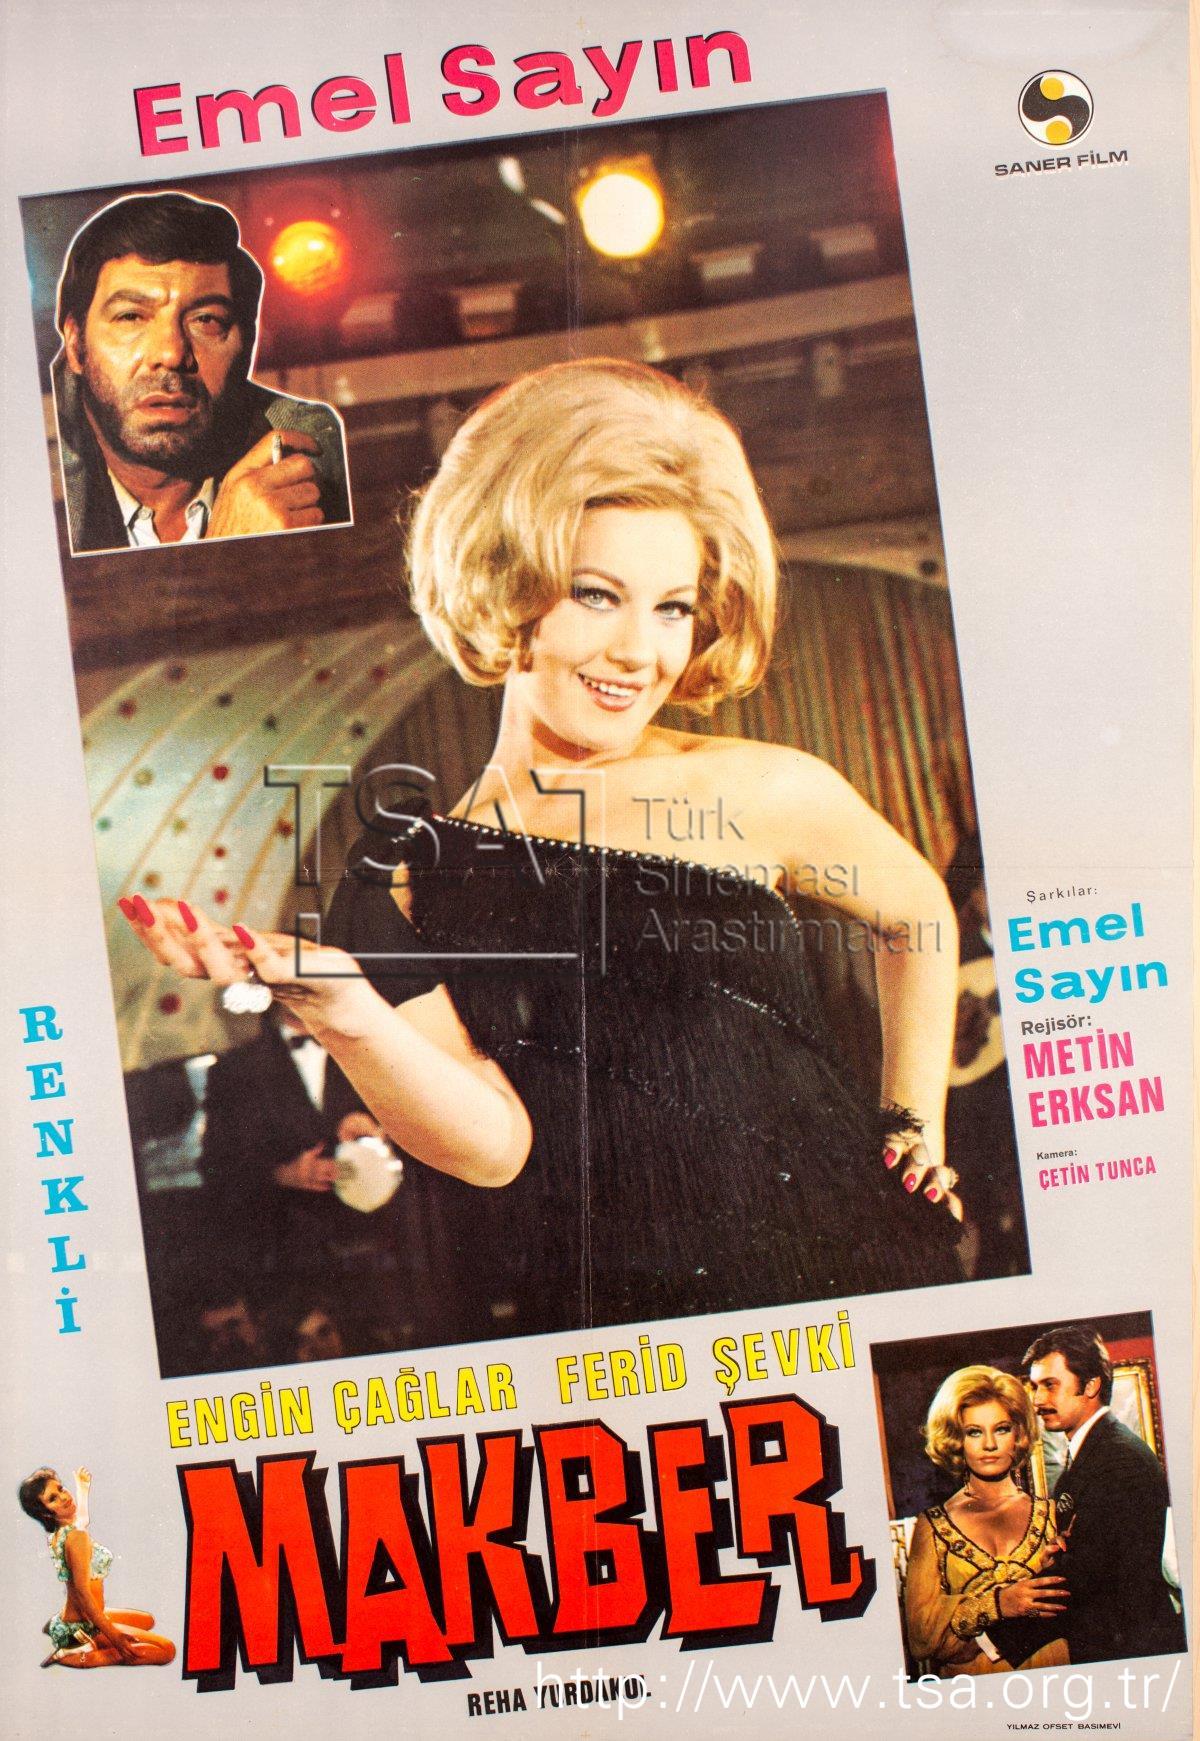 makber 1971 imdb